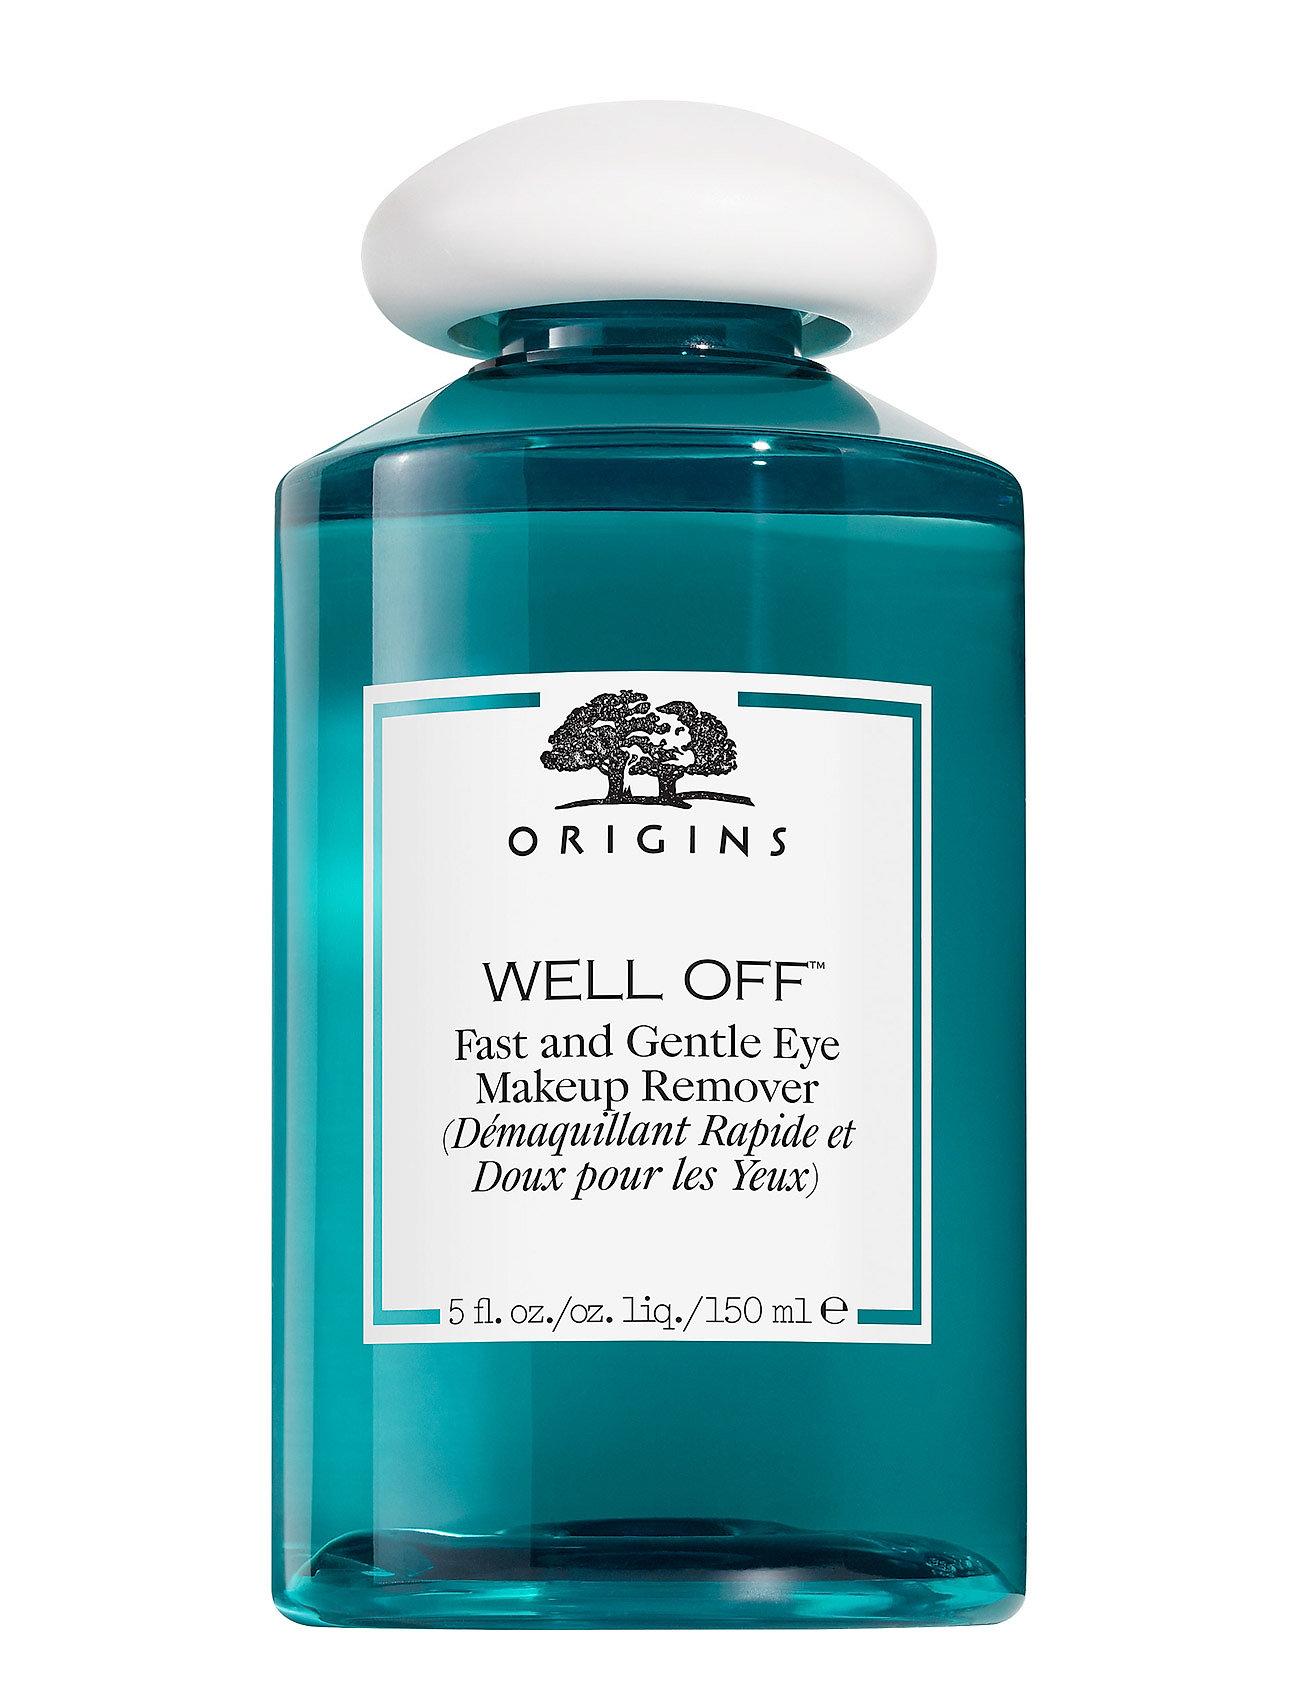 Well offâ® fast and gentle eye makeup remover fra origins fra boozt.com dk